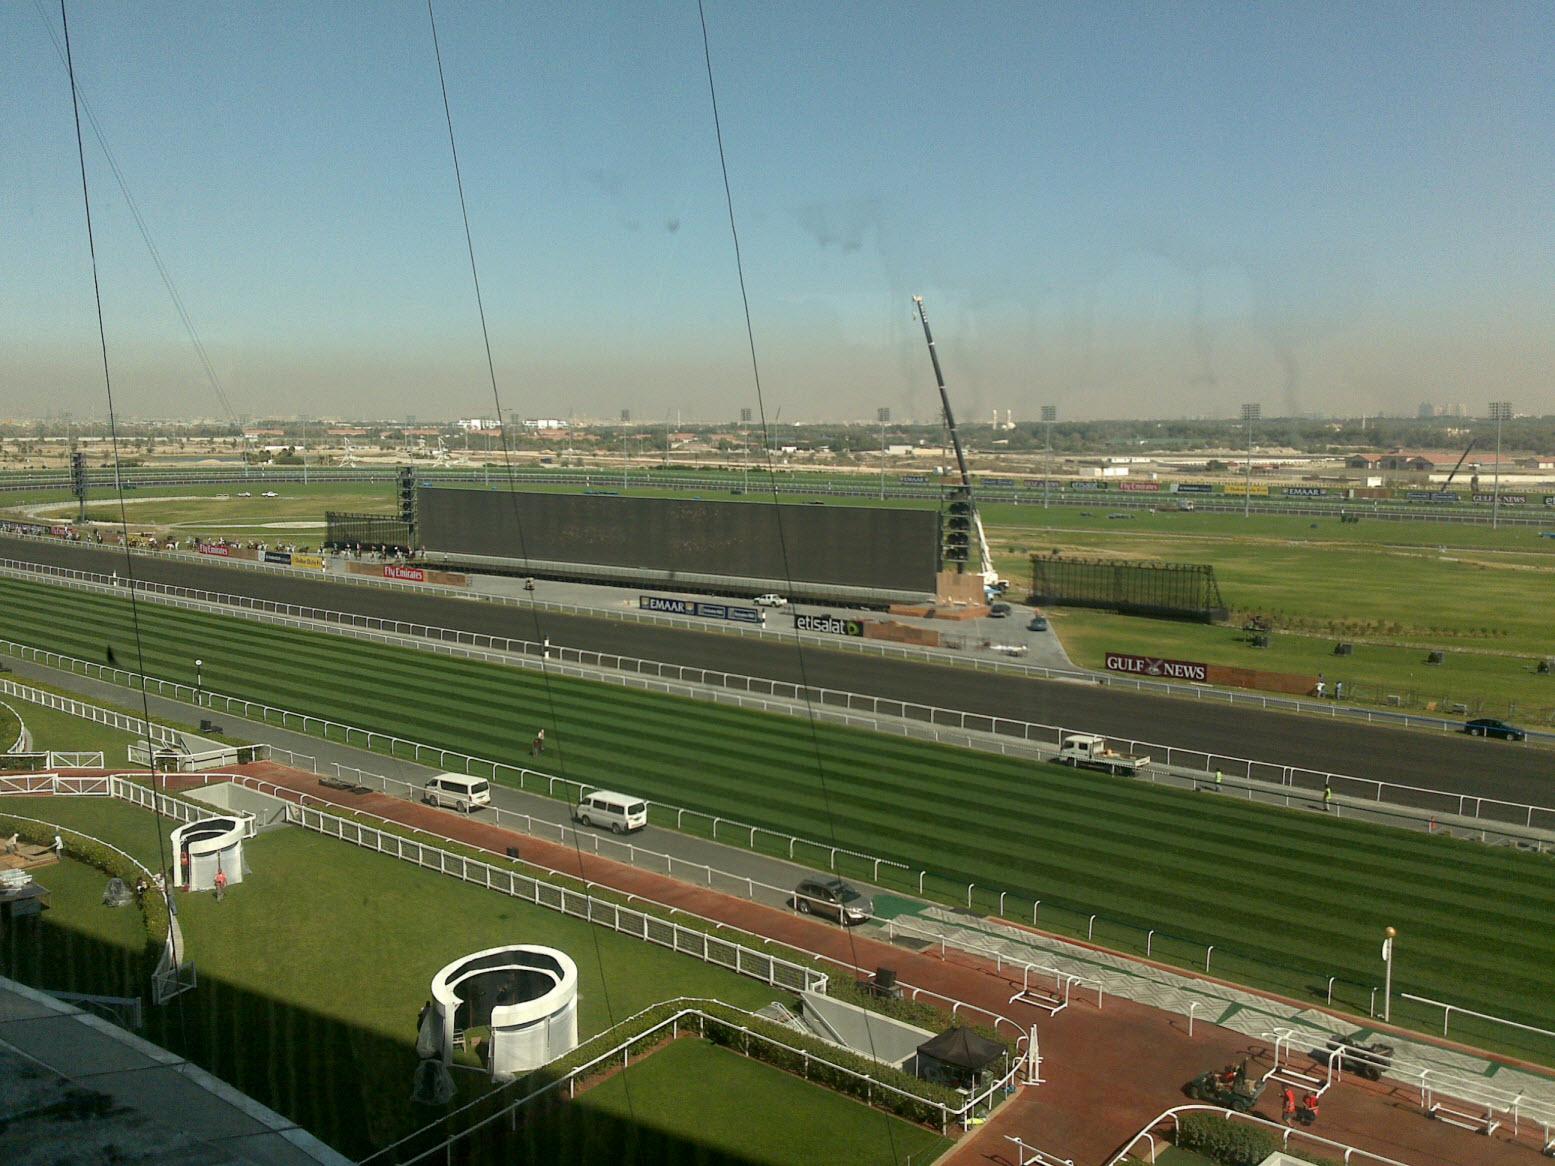 Dubai Horse Race 2011 (6)